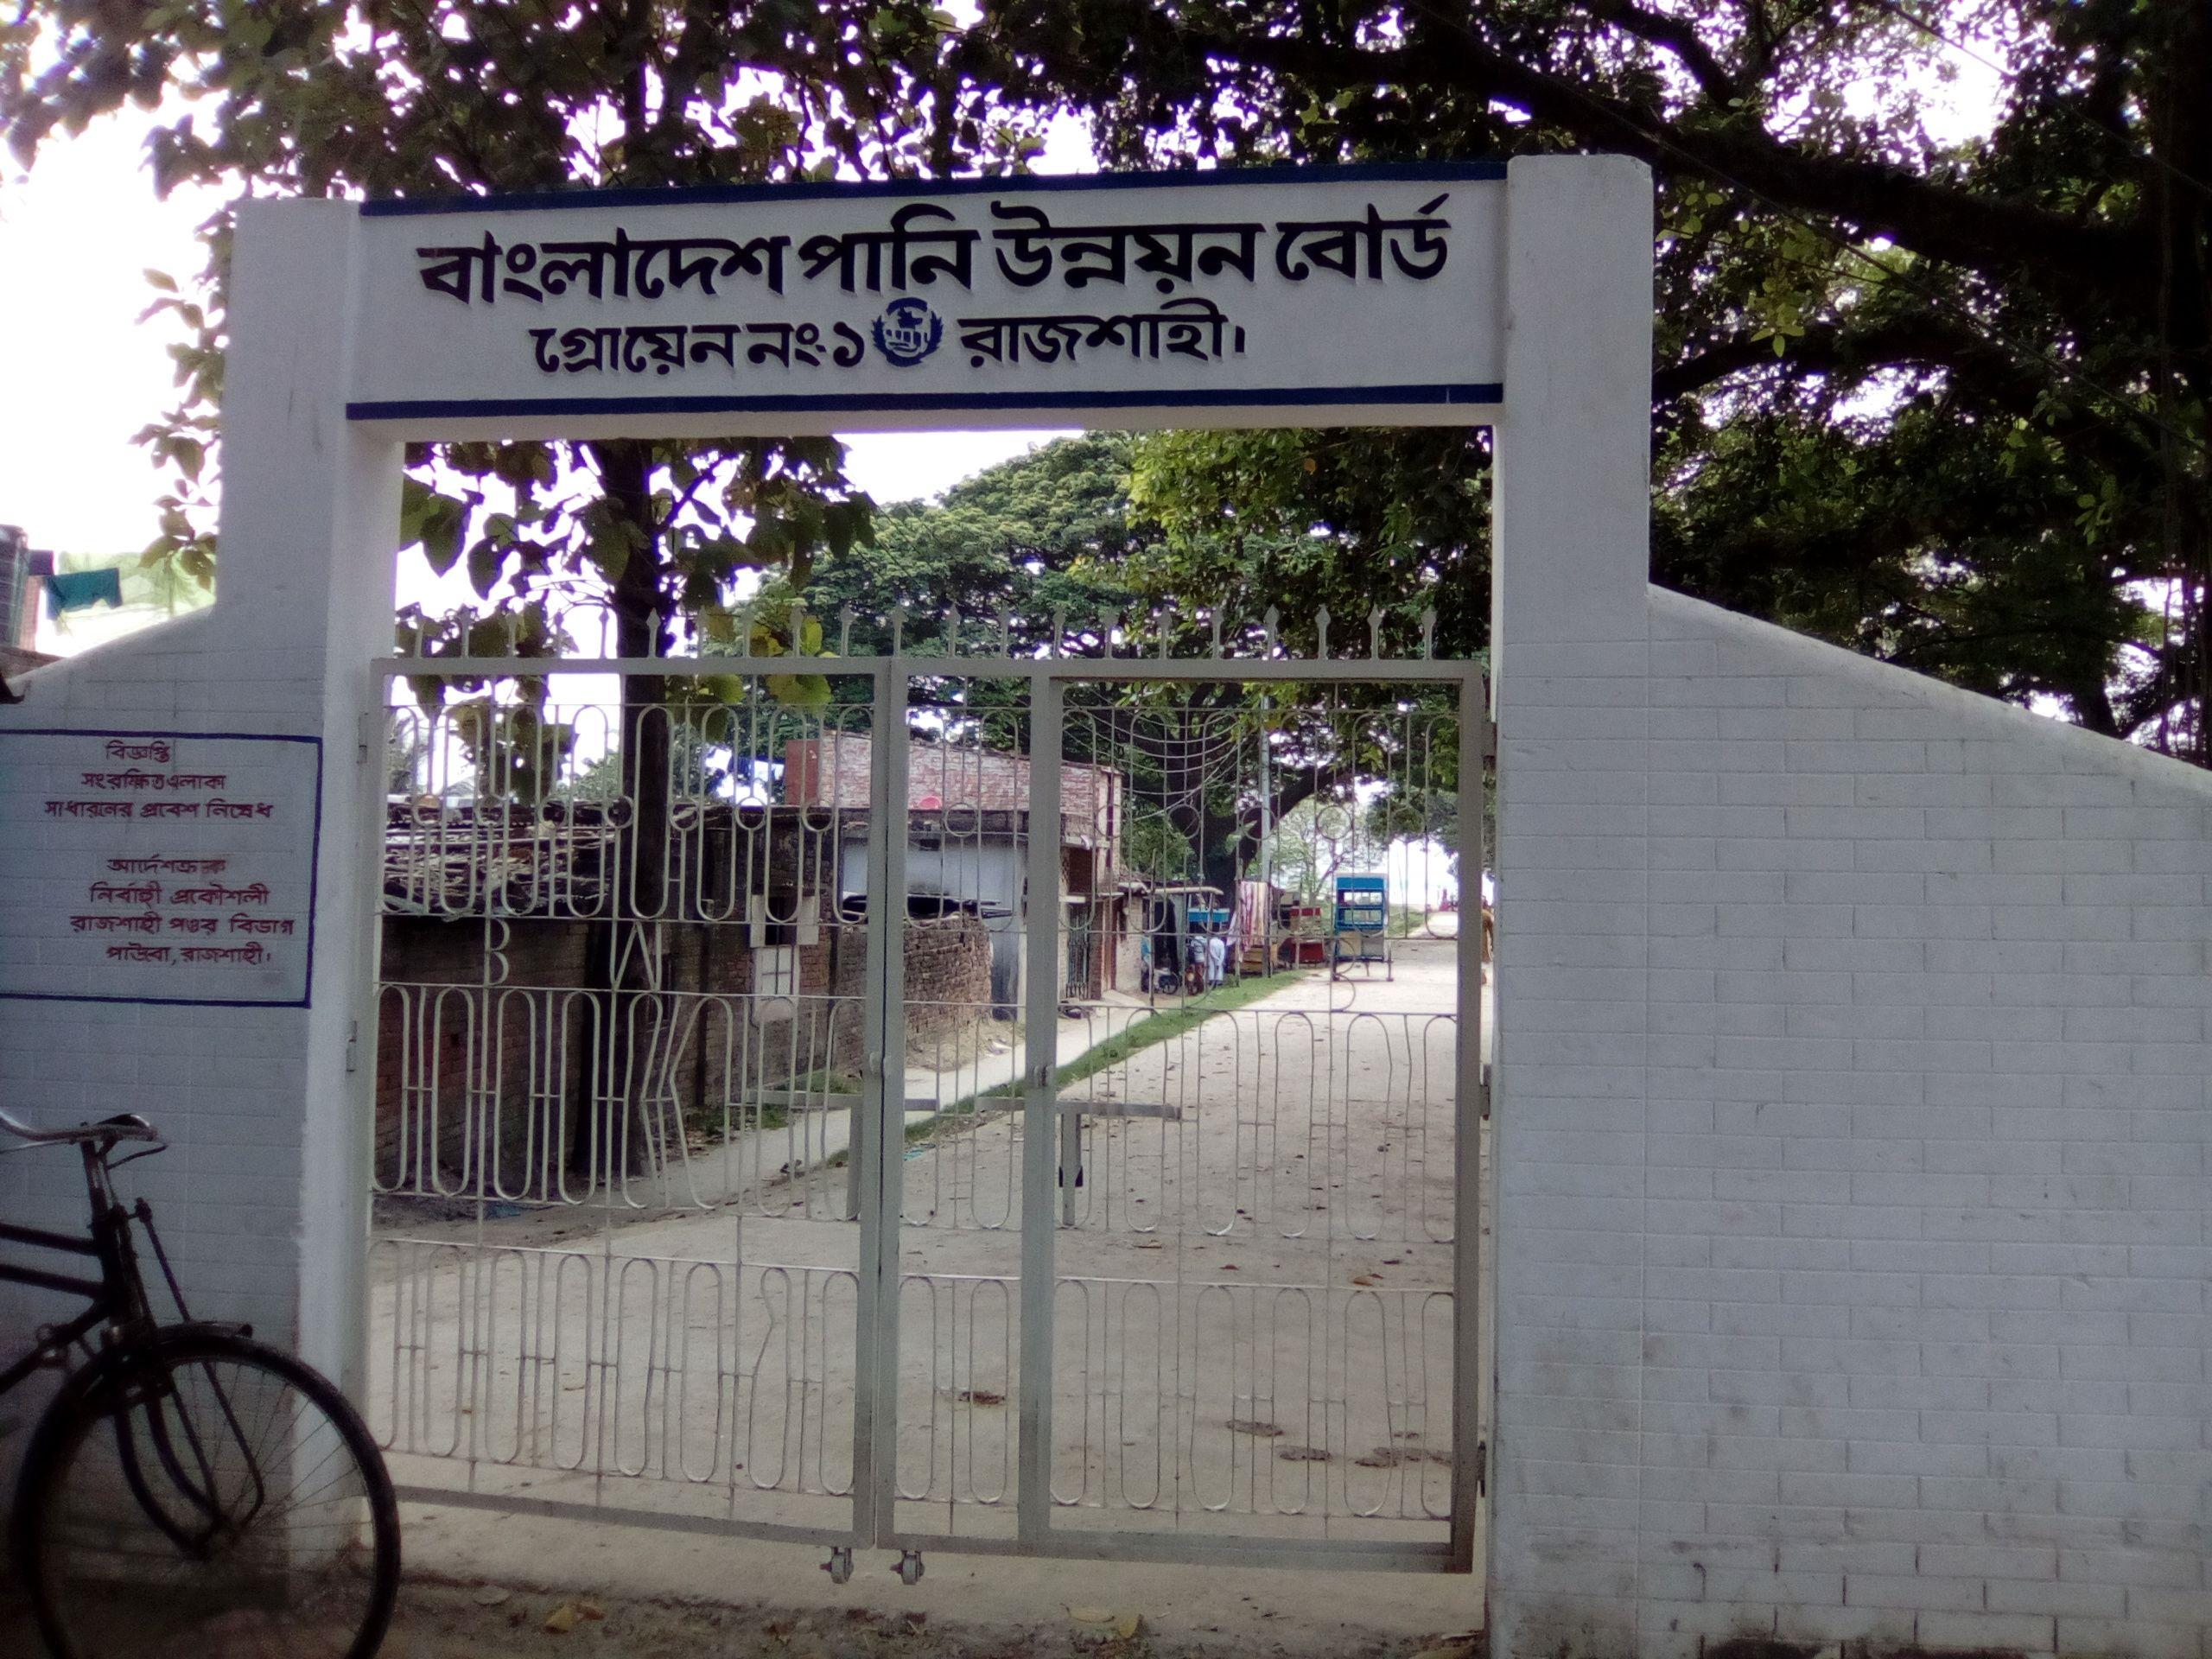 Bangladesh Water Development Board